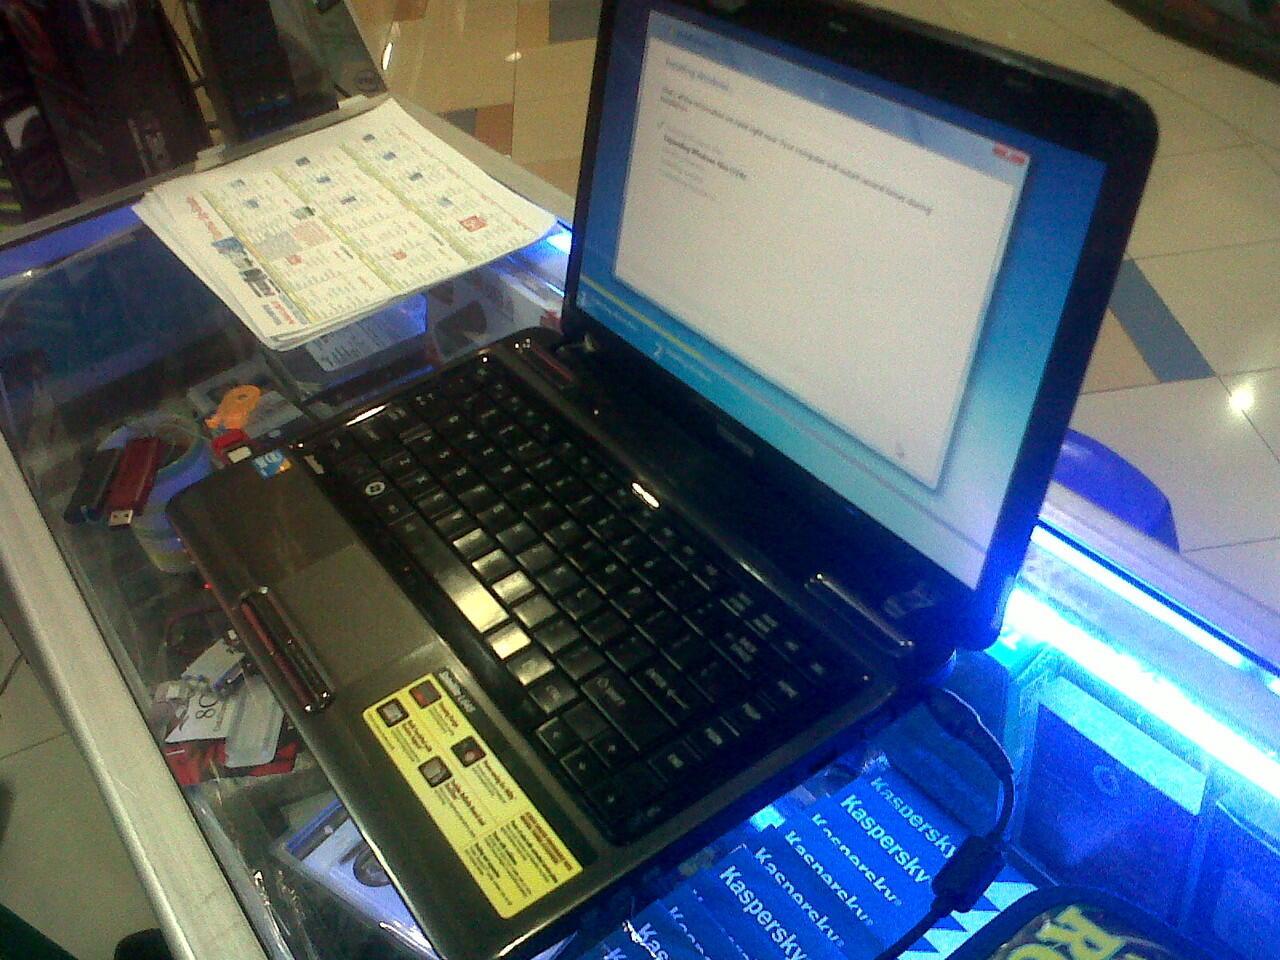 Jual Notebook Toshiba Core i3,Hardisk 500 Gb, Mulus (Bandung)